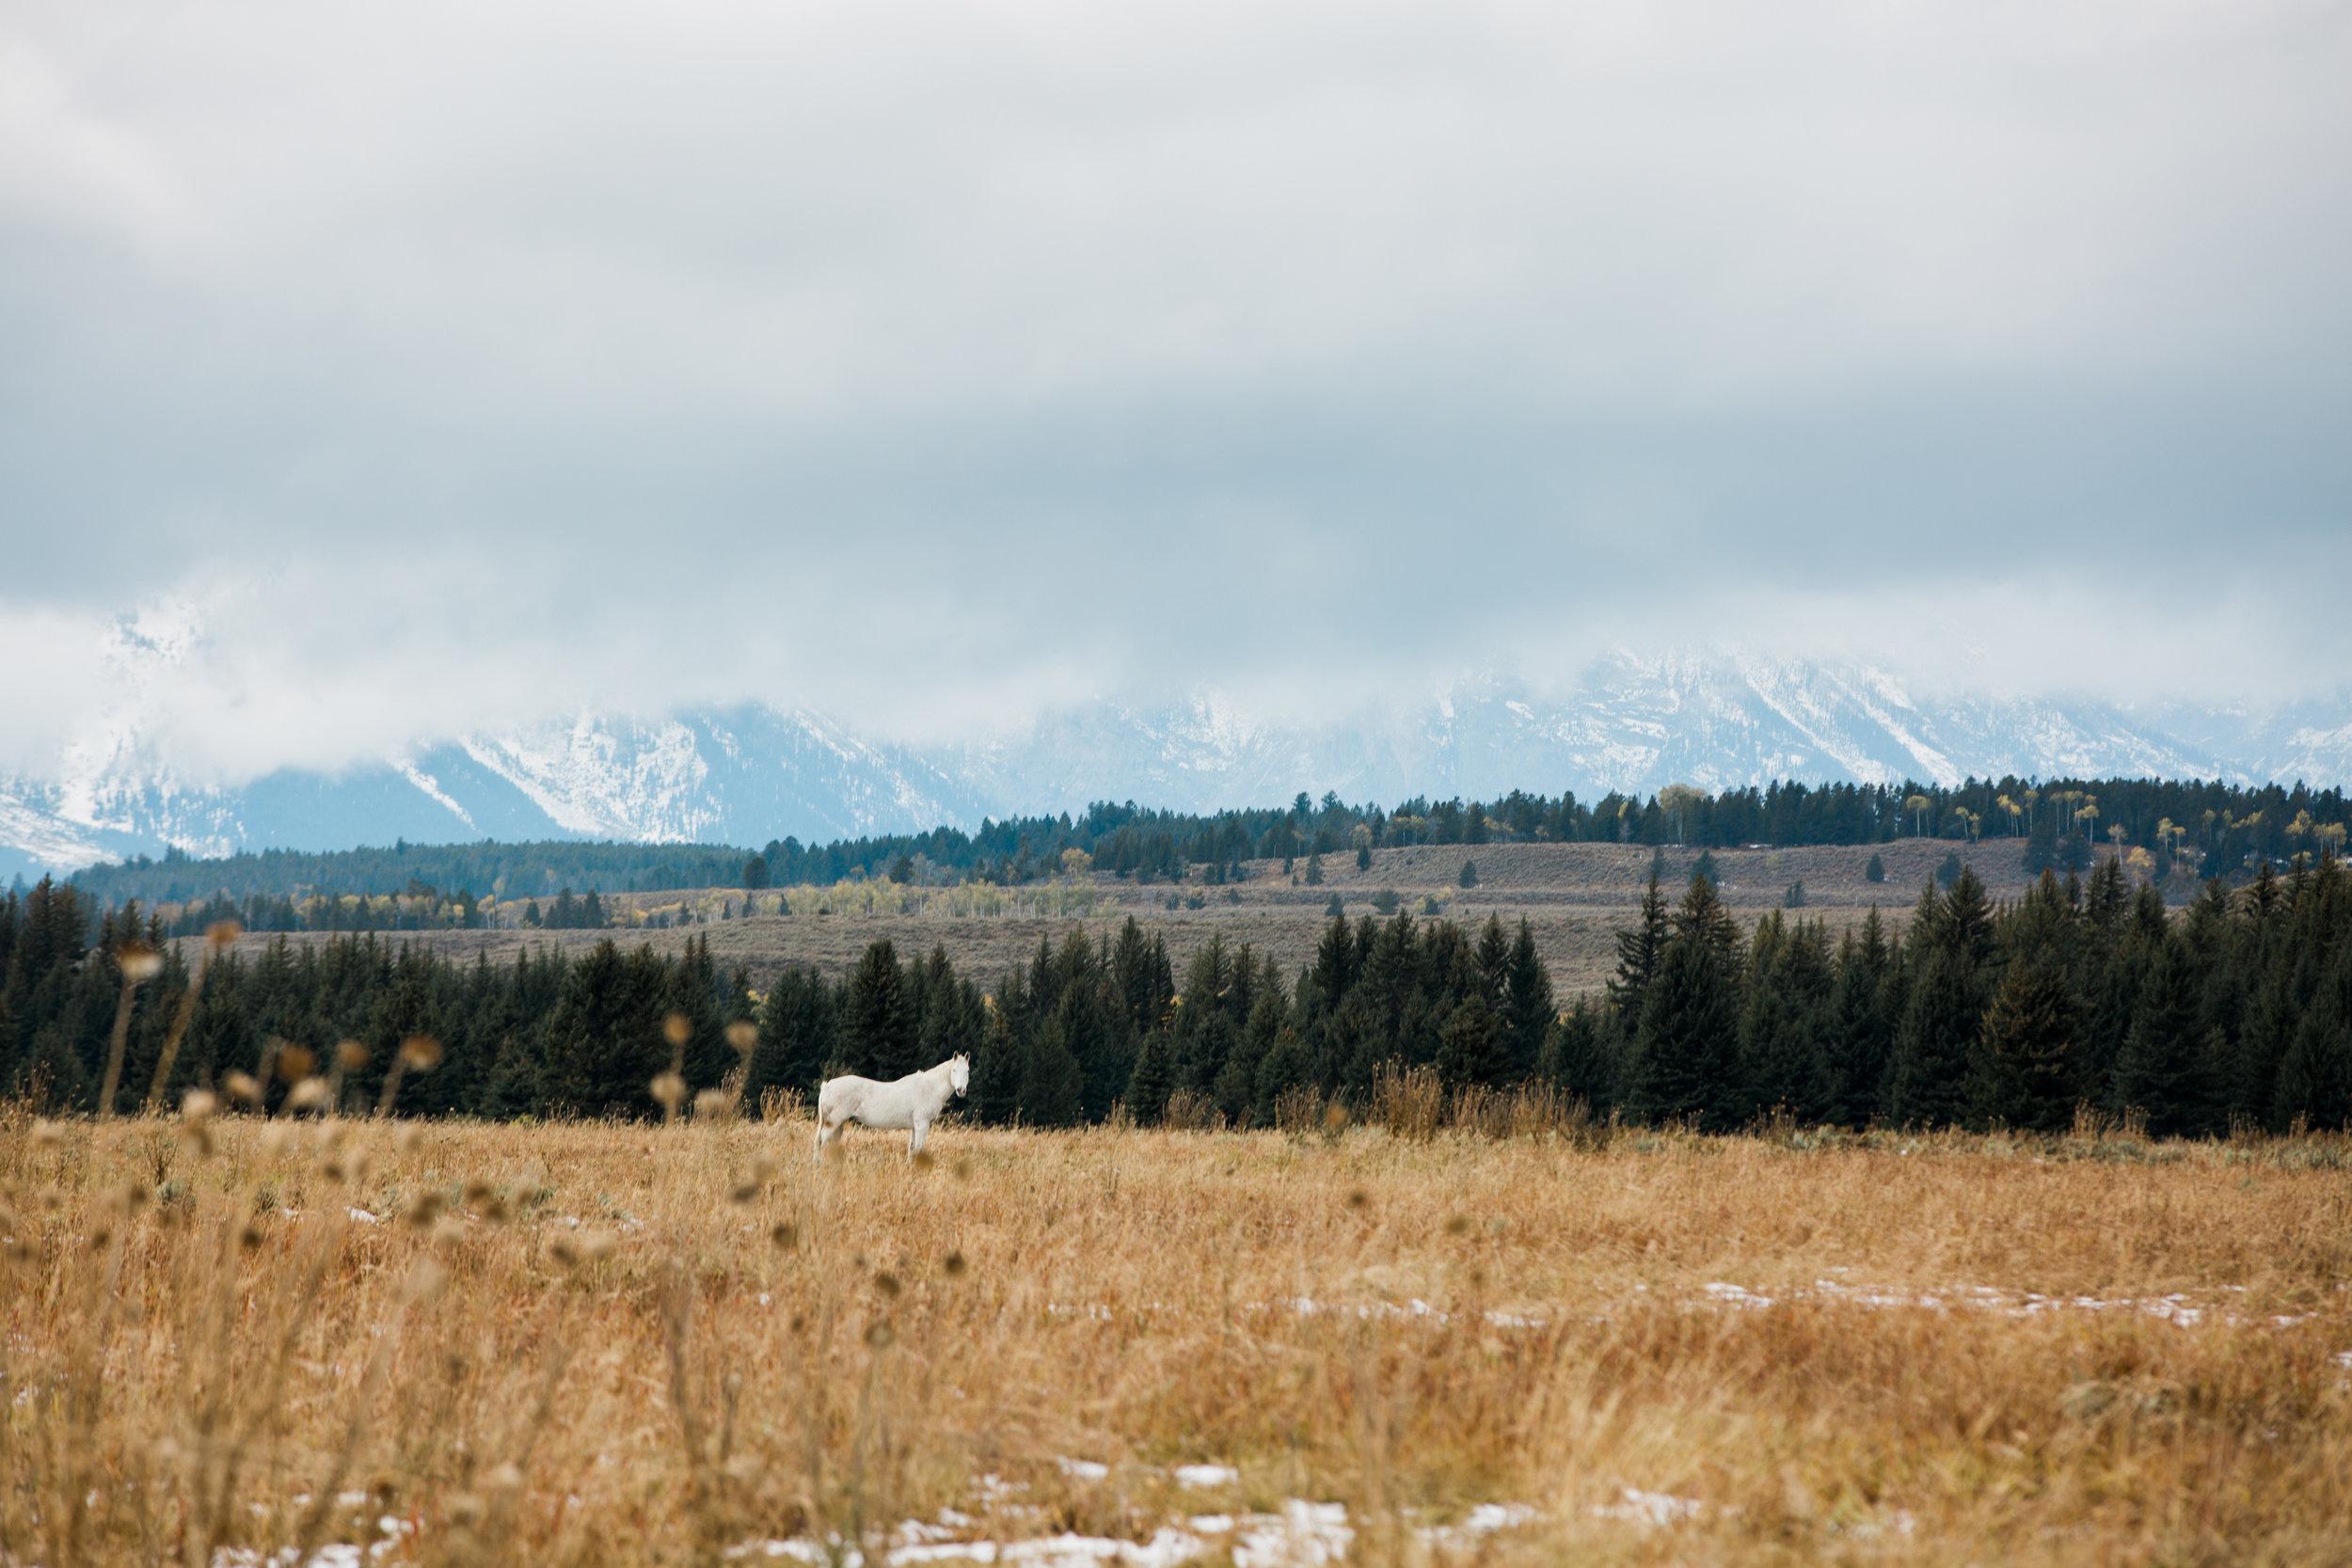 CindyGiovagnoli_outdoor_adventure_photography_Grand_Teton_Yellowstone_Glacier_National_Park_Montana_Wyoming_South_Dakota_Mount_Rushmore_Badlands-007.jpg